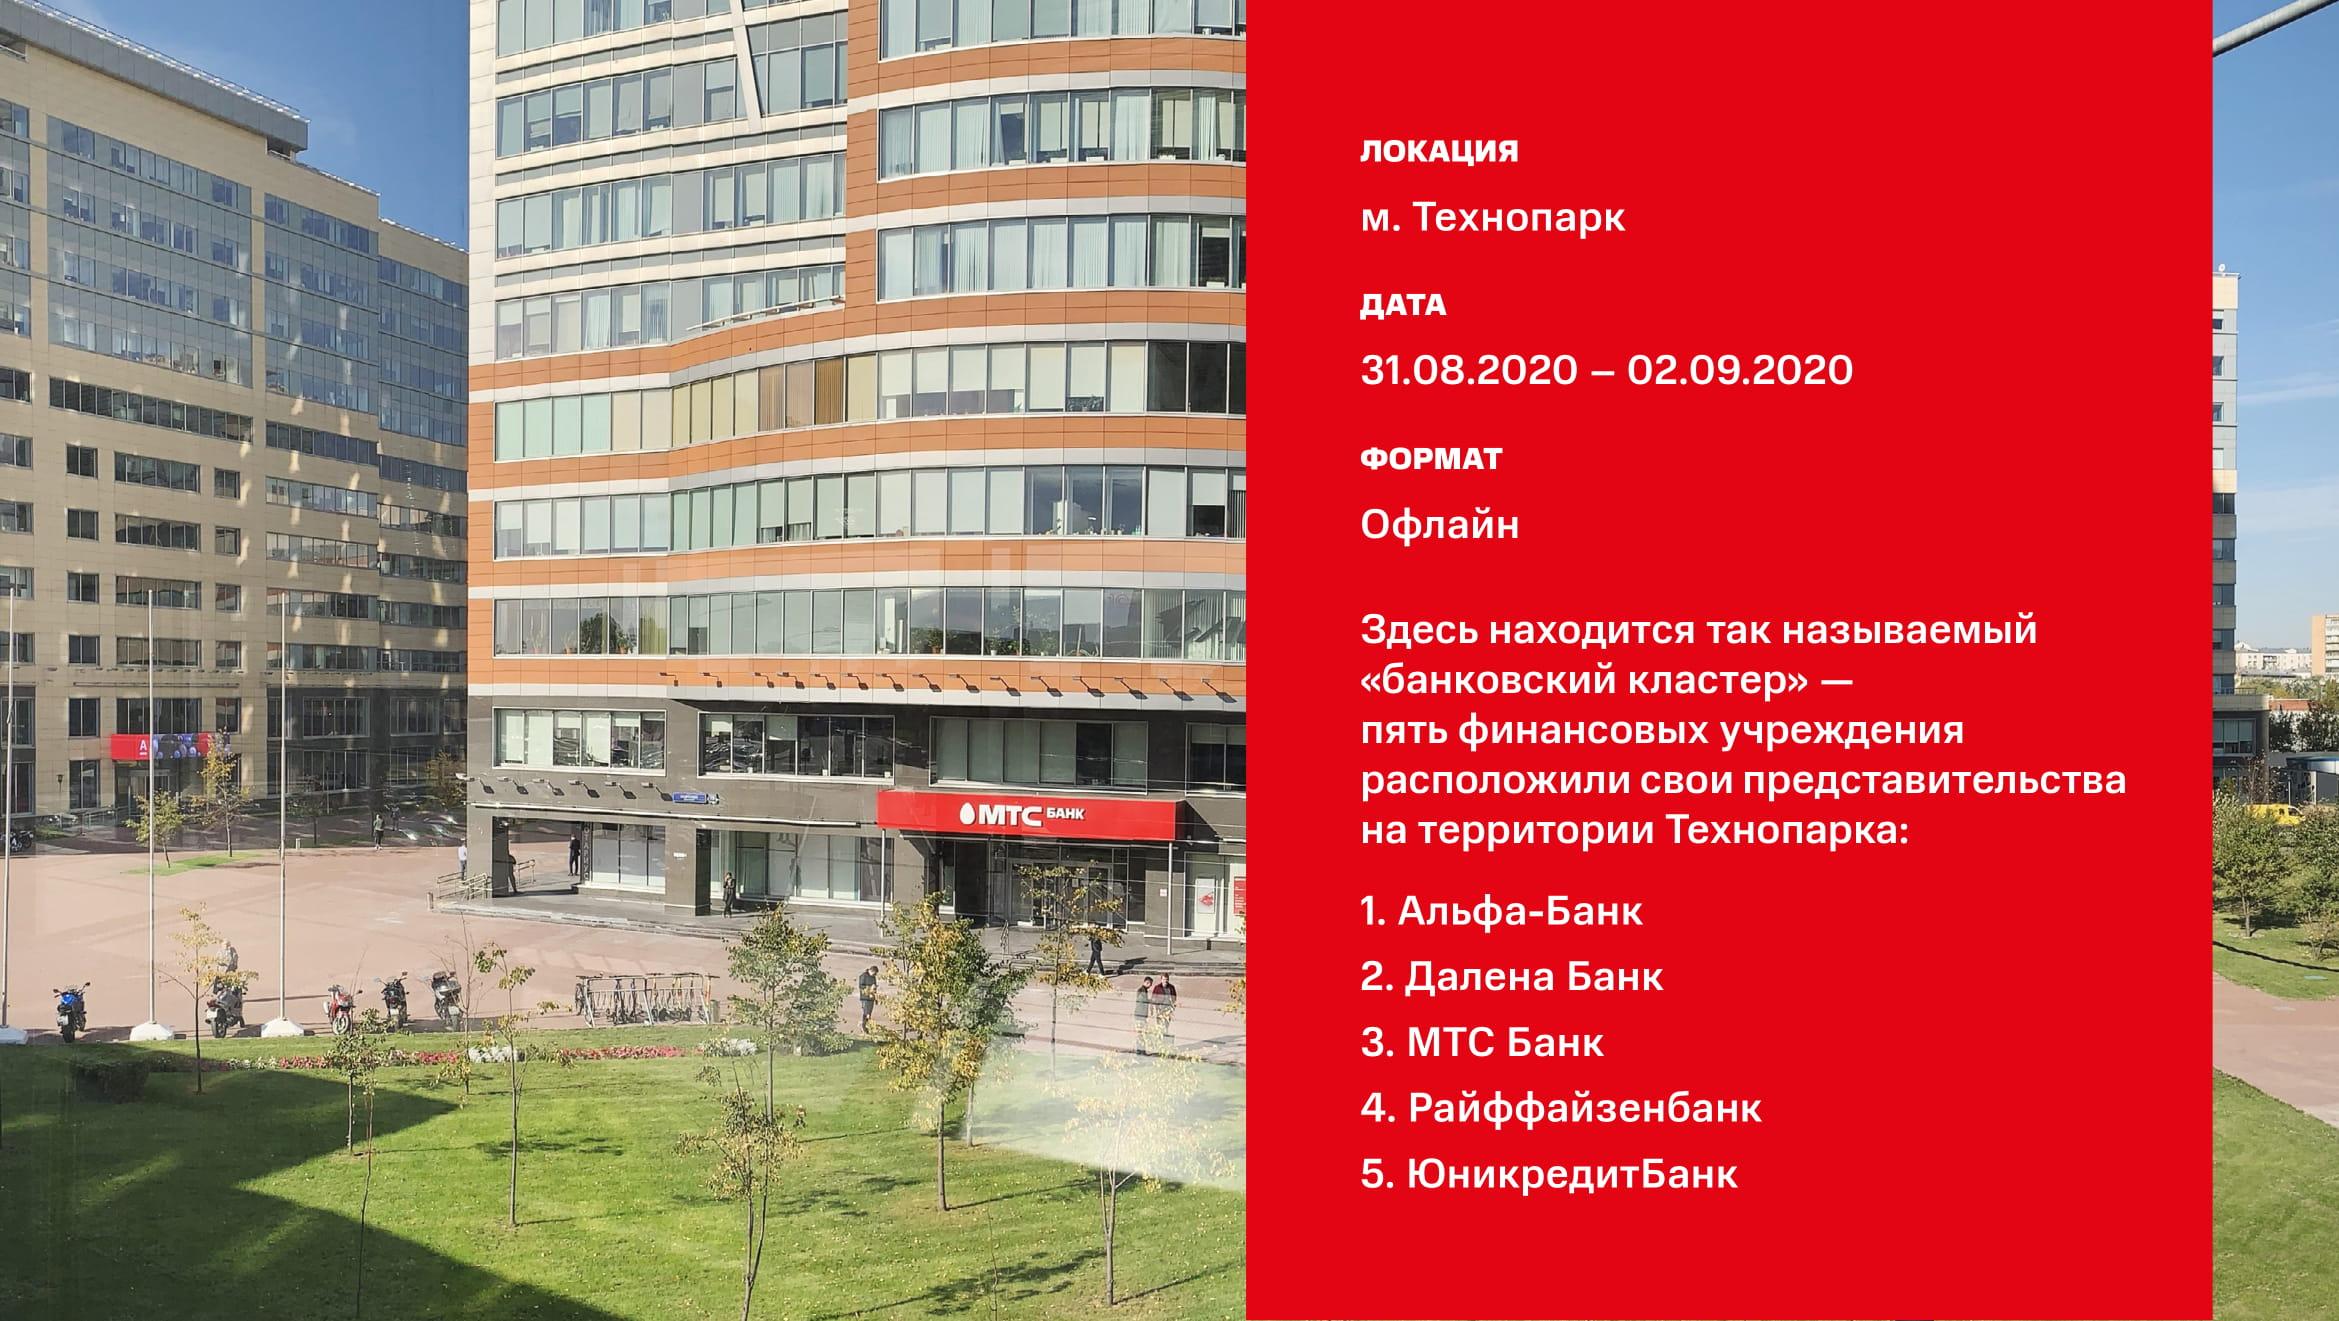 RFA_Креатив-года-2020_МТС-Банк-VS-Альфа-Банк-02